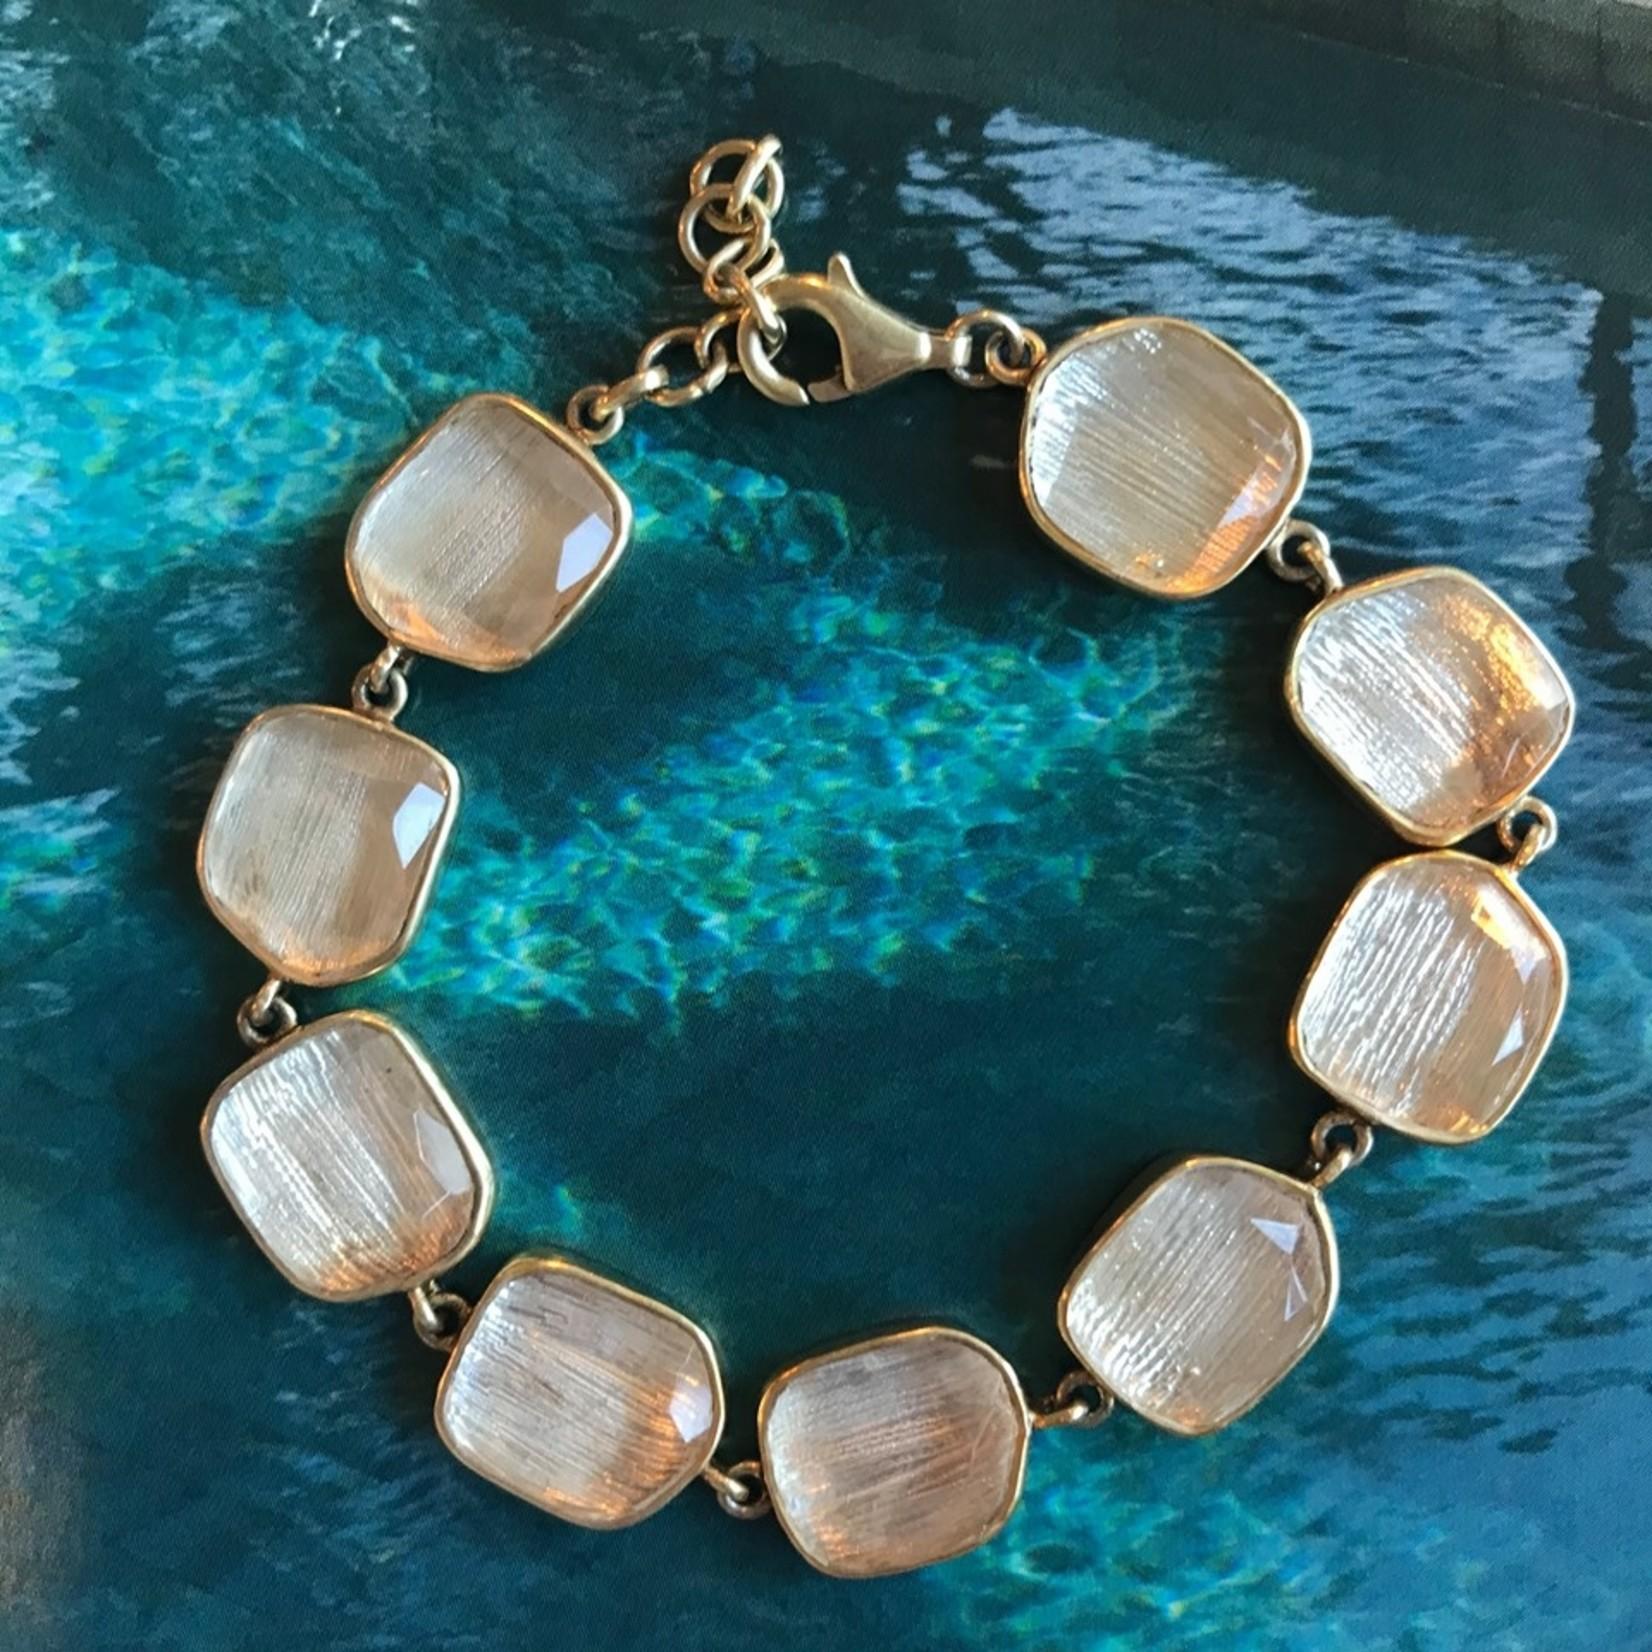 Himatsingka Jewelry Himatsingka Jewelry Miro Crystal Bracelet